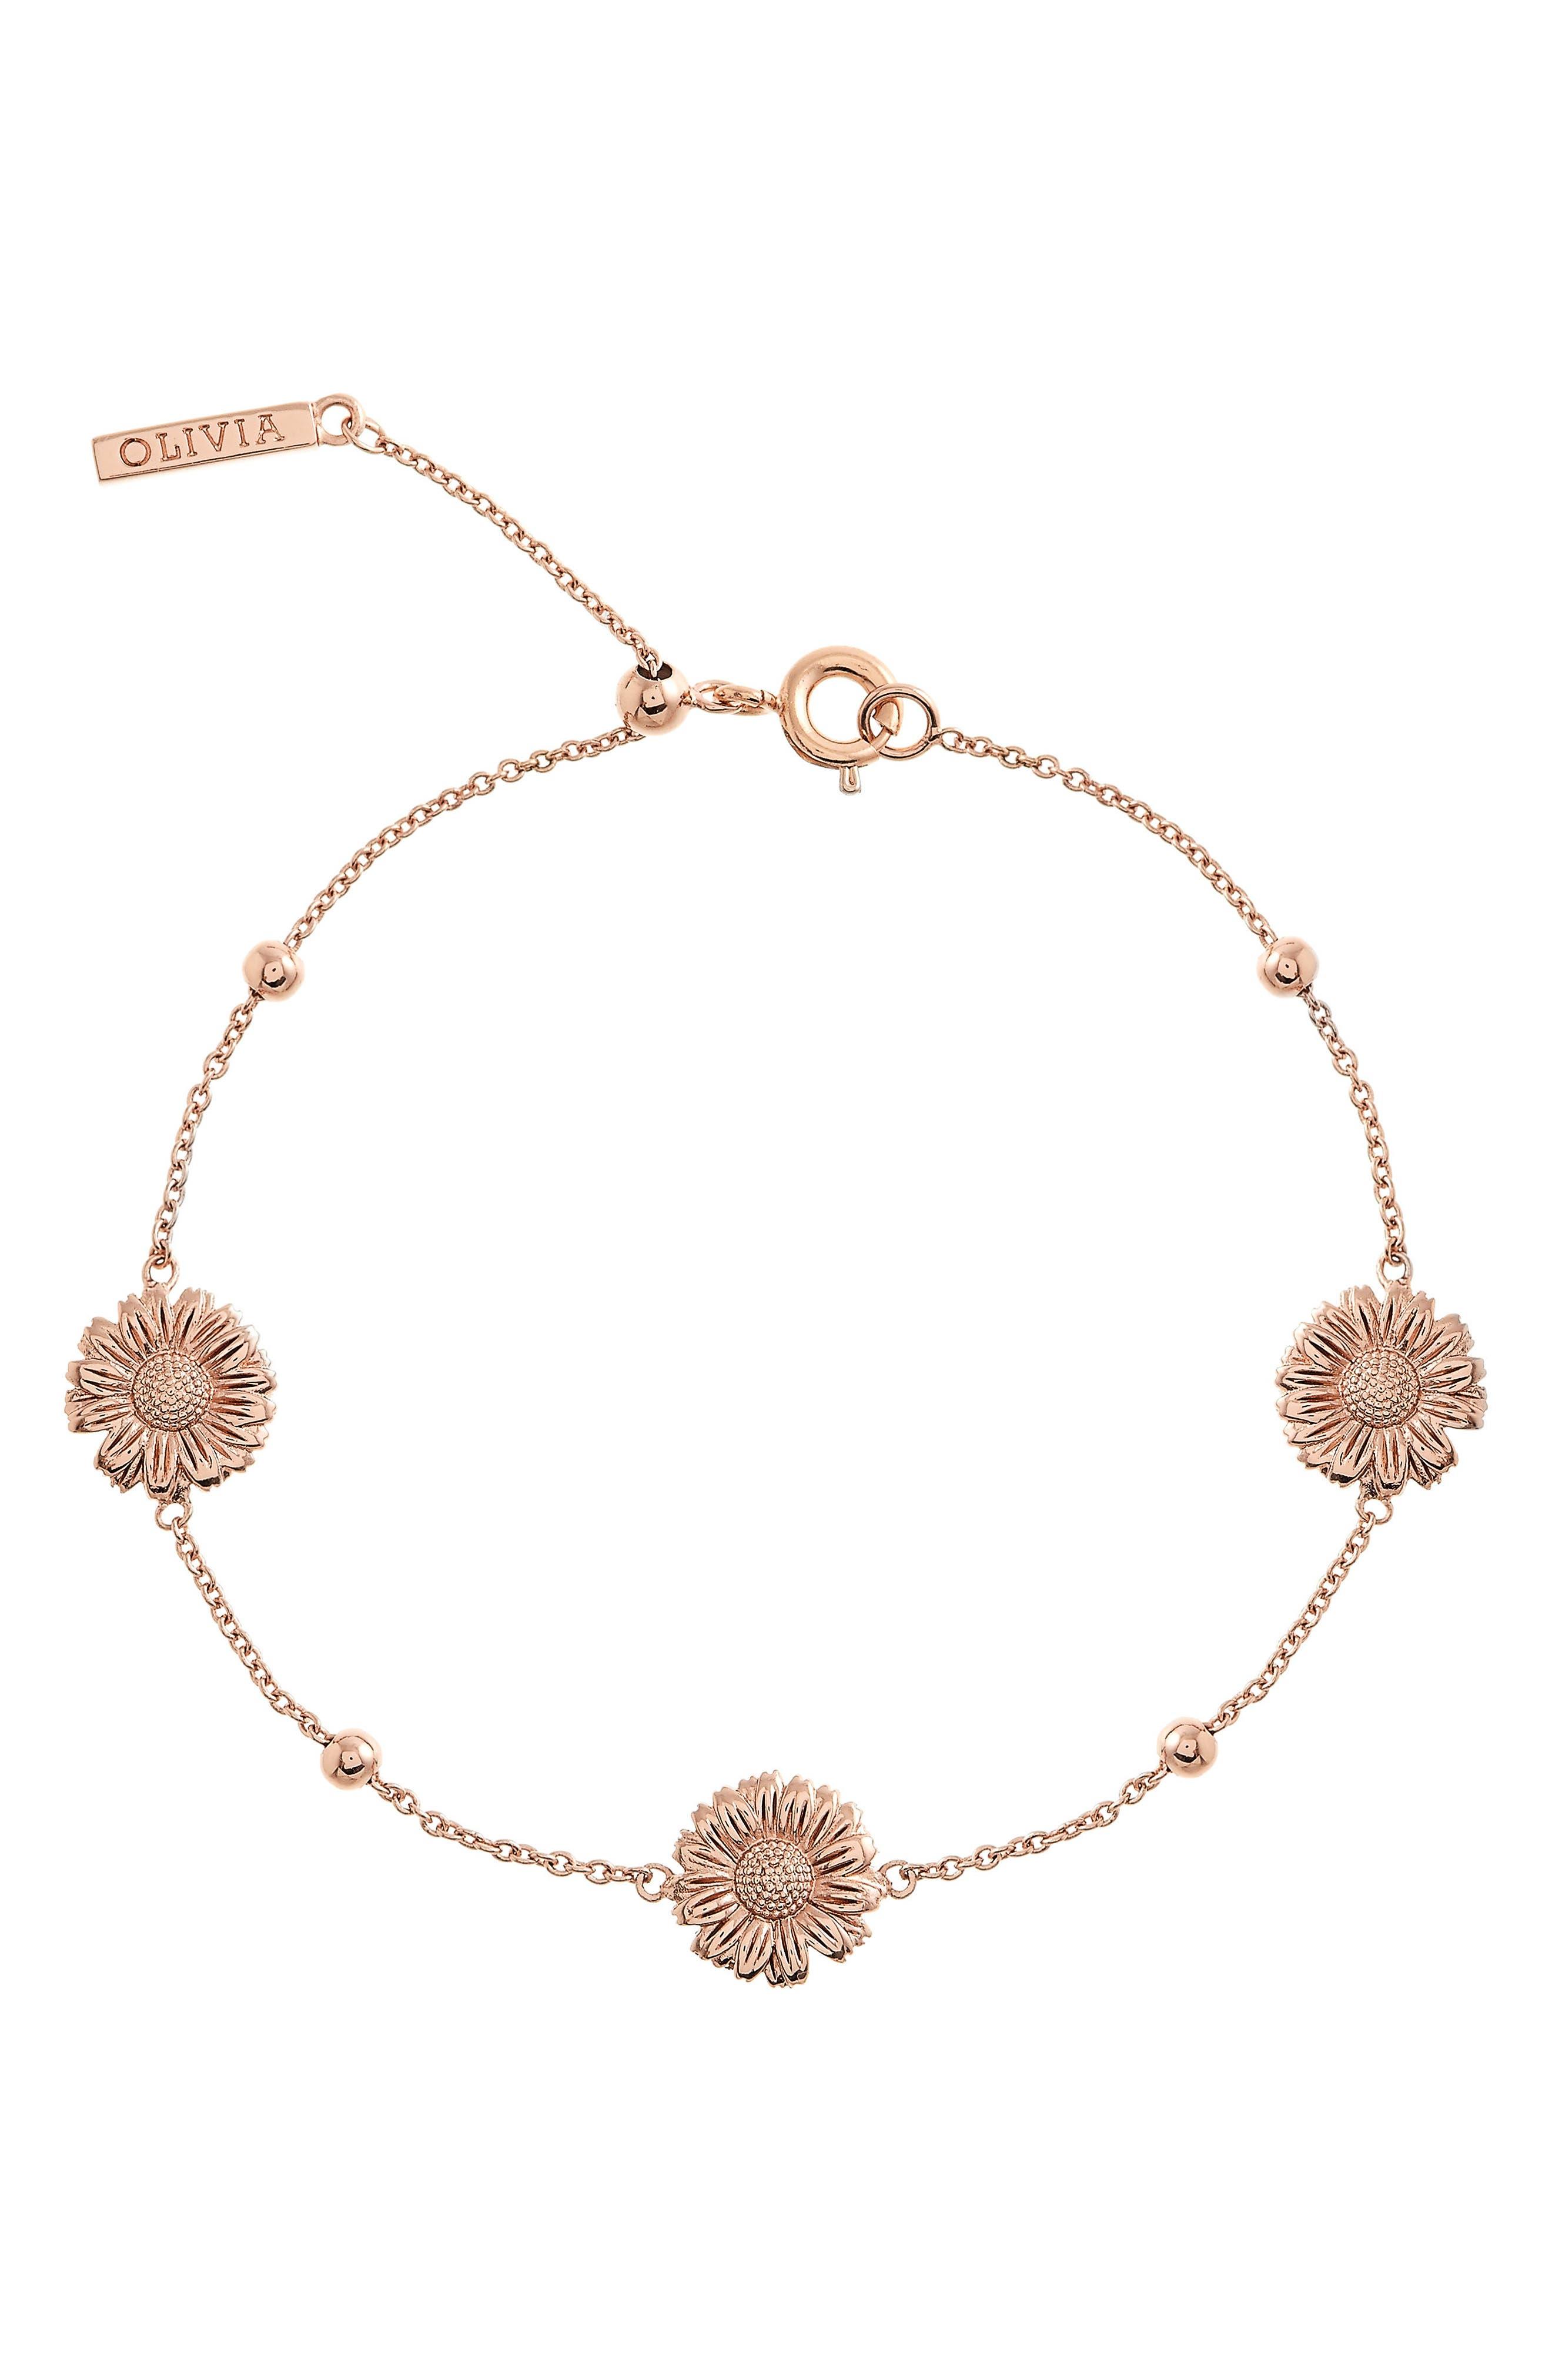 3D Daisy Ball Chain Bracelet,                         Main,                         color, ROSE GOLD